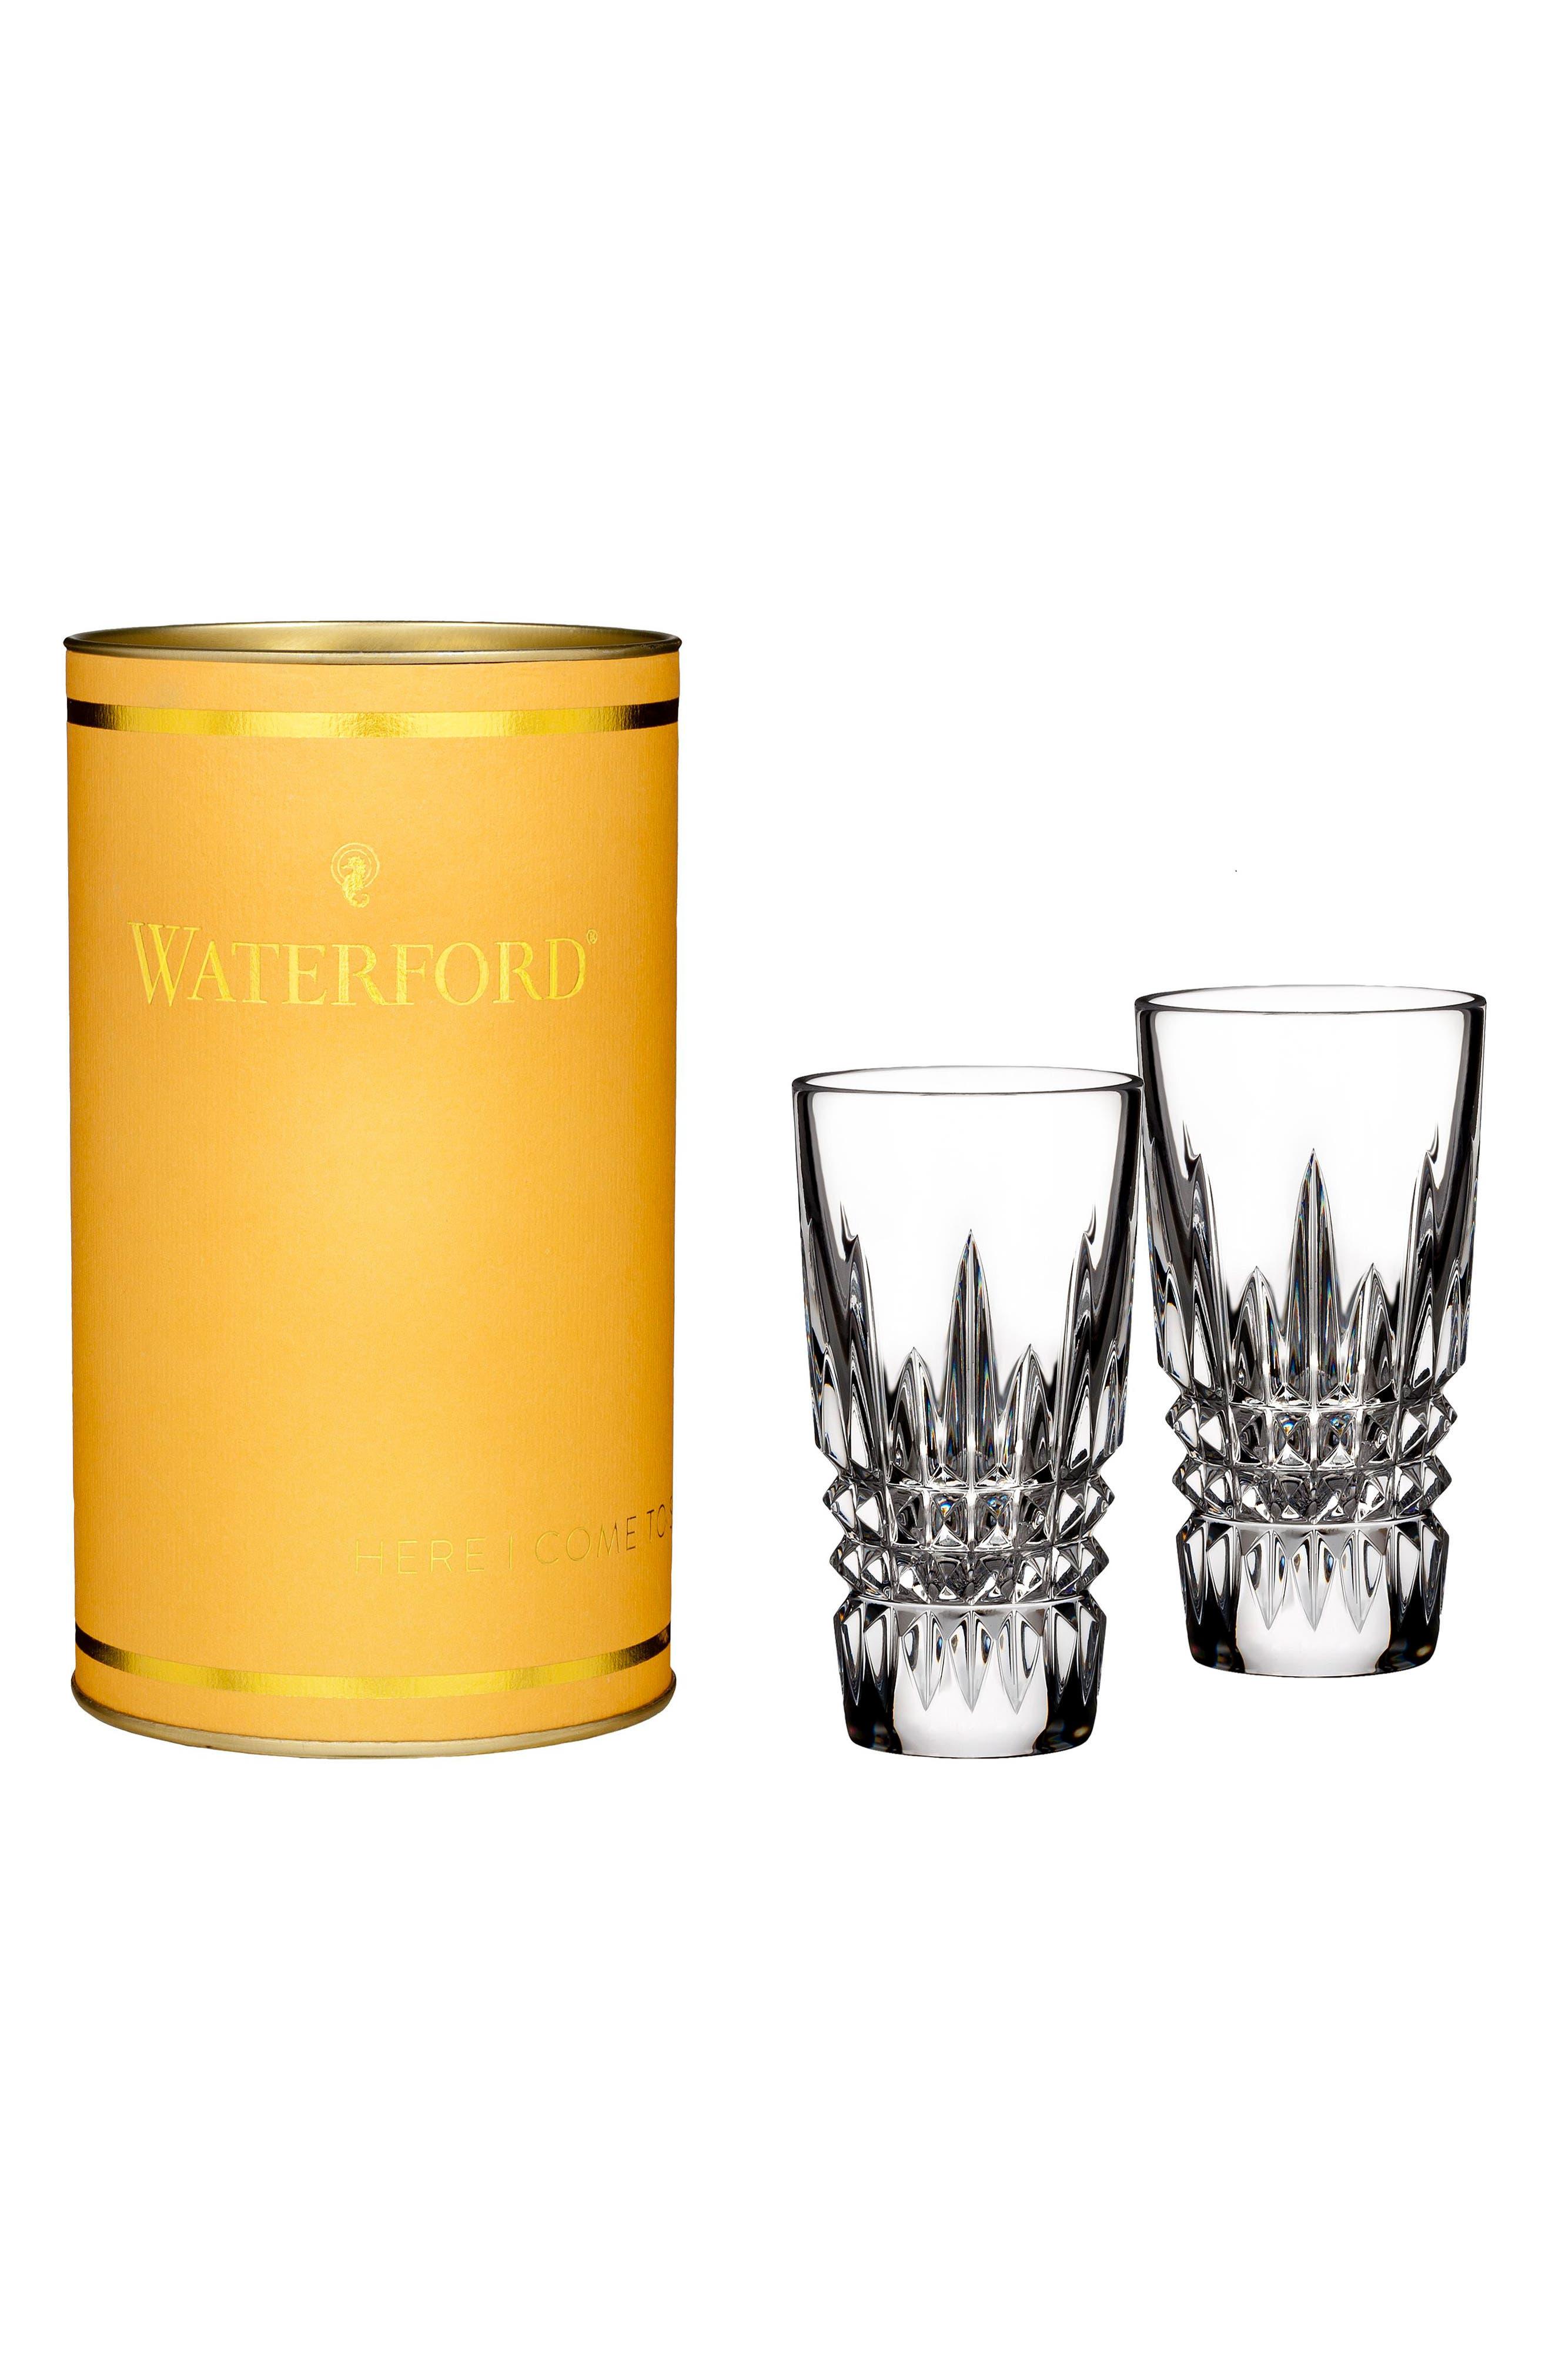 Main Image - Waterford Giftology Lismore Diamond Set of 2 Lead Crystal Shot Glasses